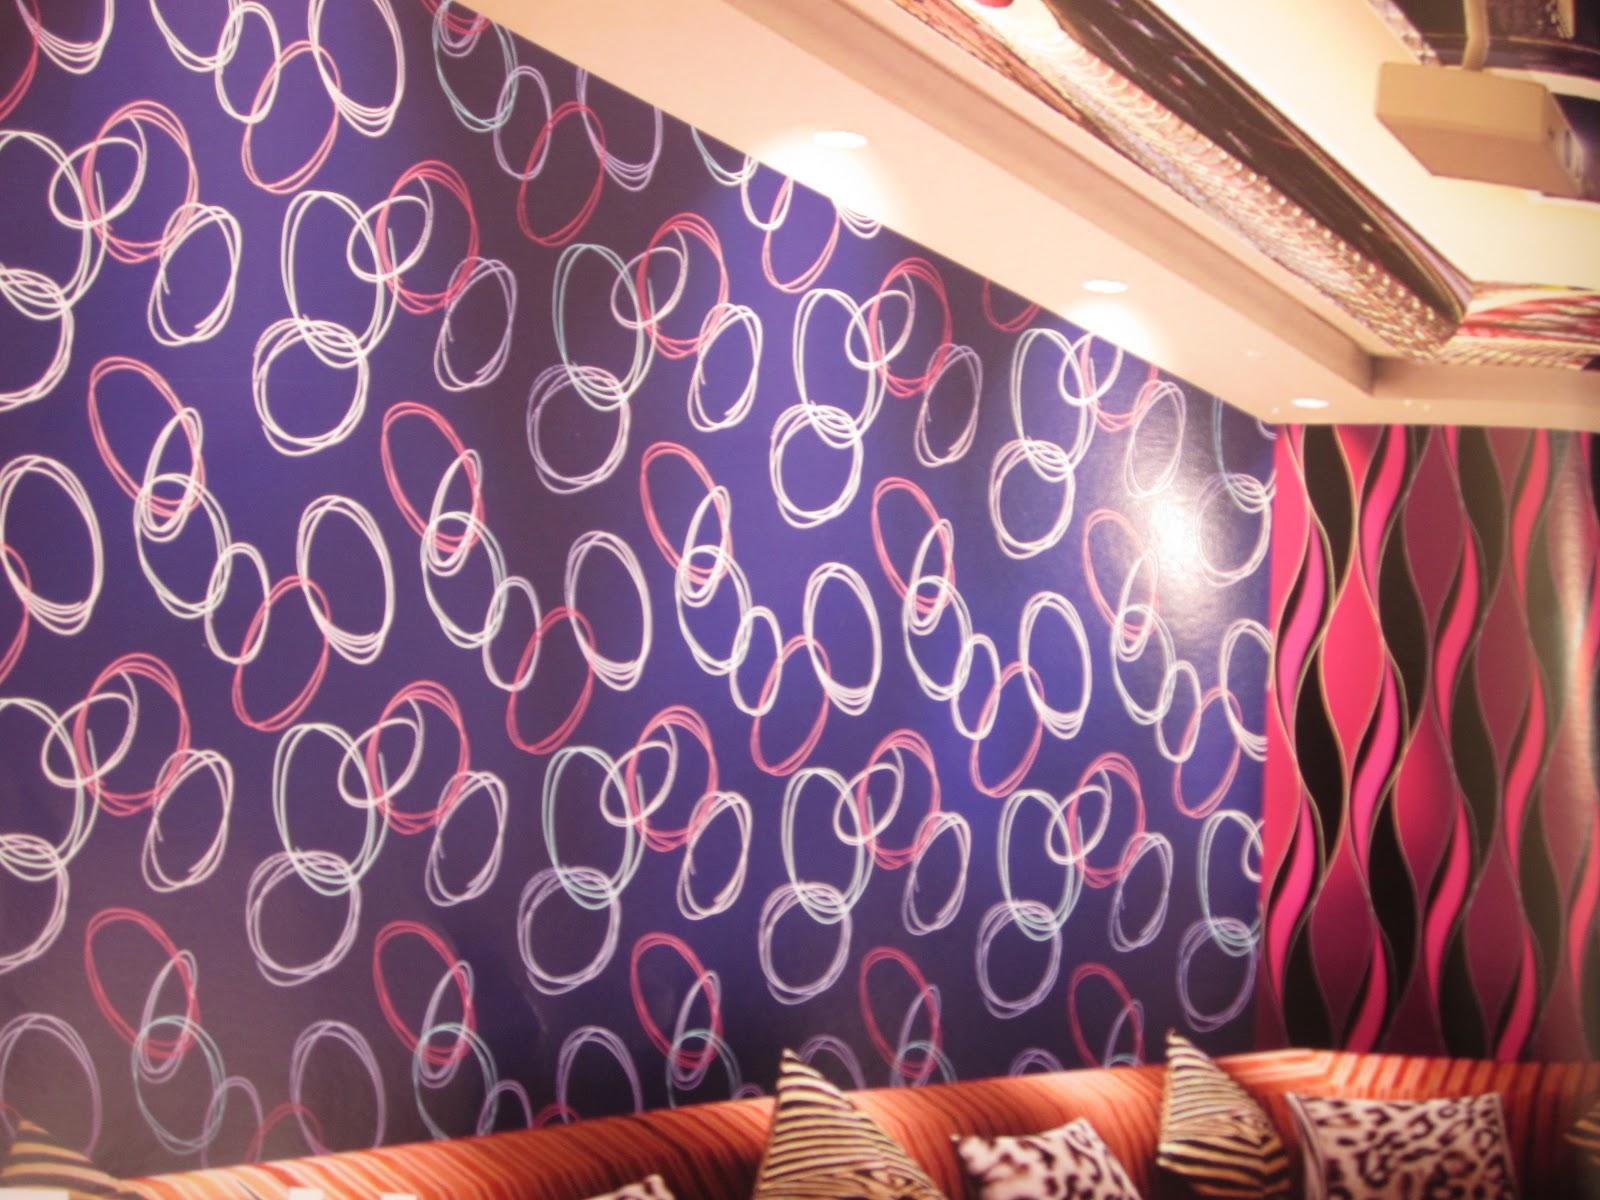 Jual Wallpaper Dinding Di Jabodetabek 085891870654 Jual Kitchen